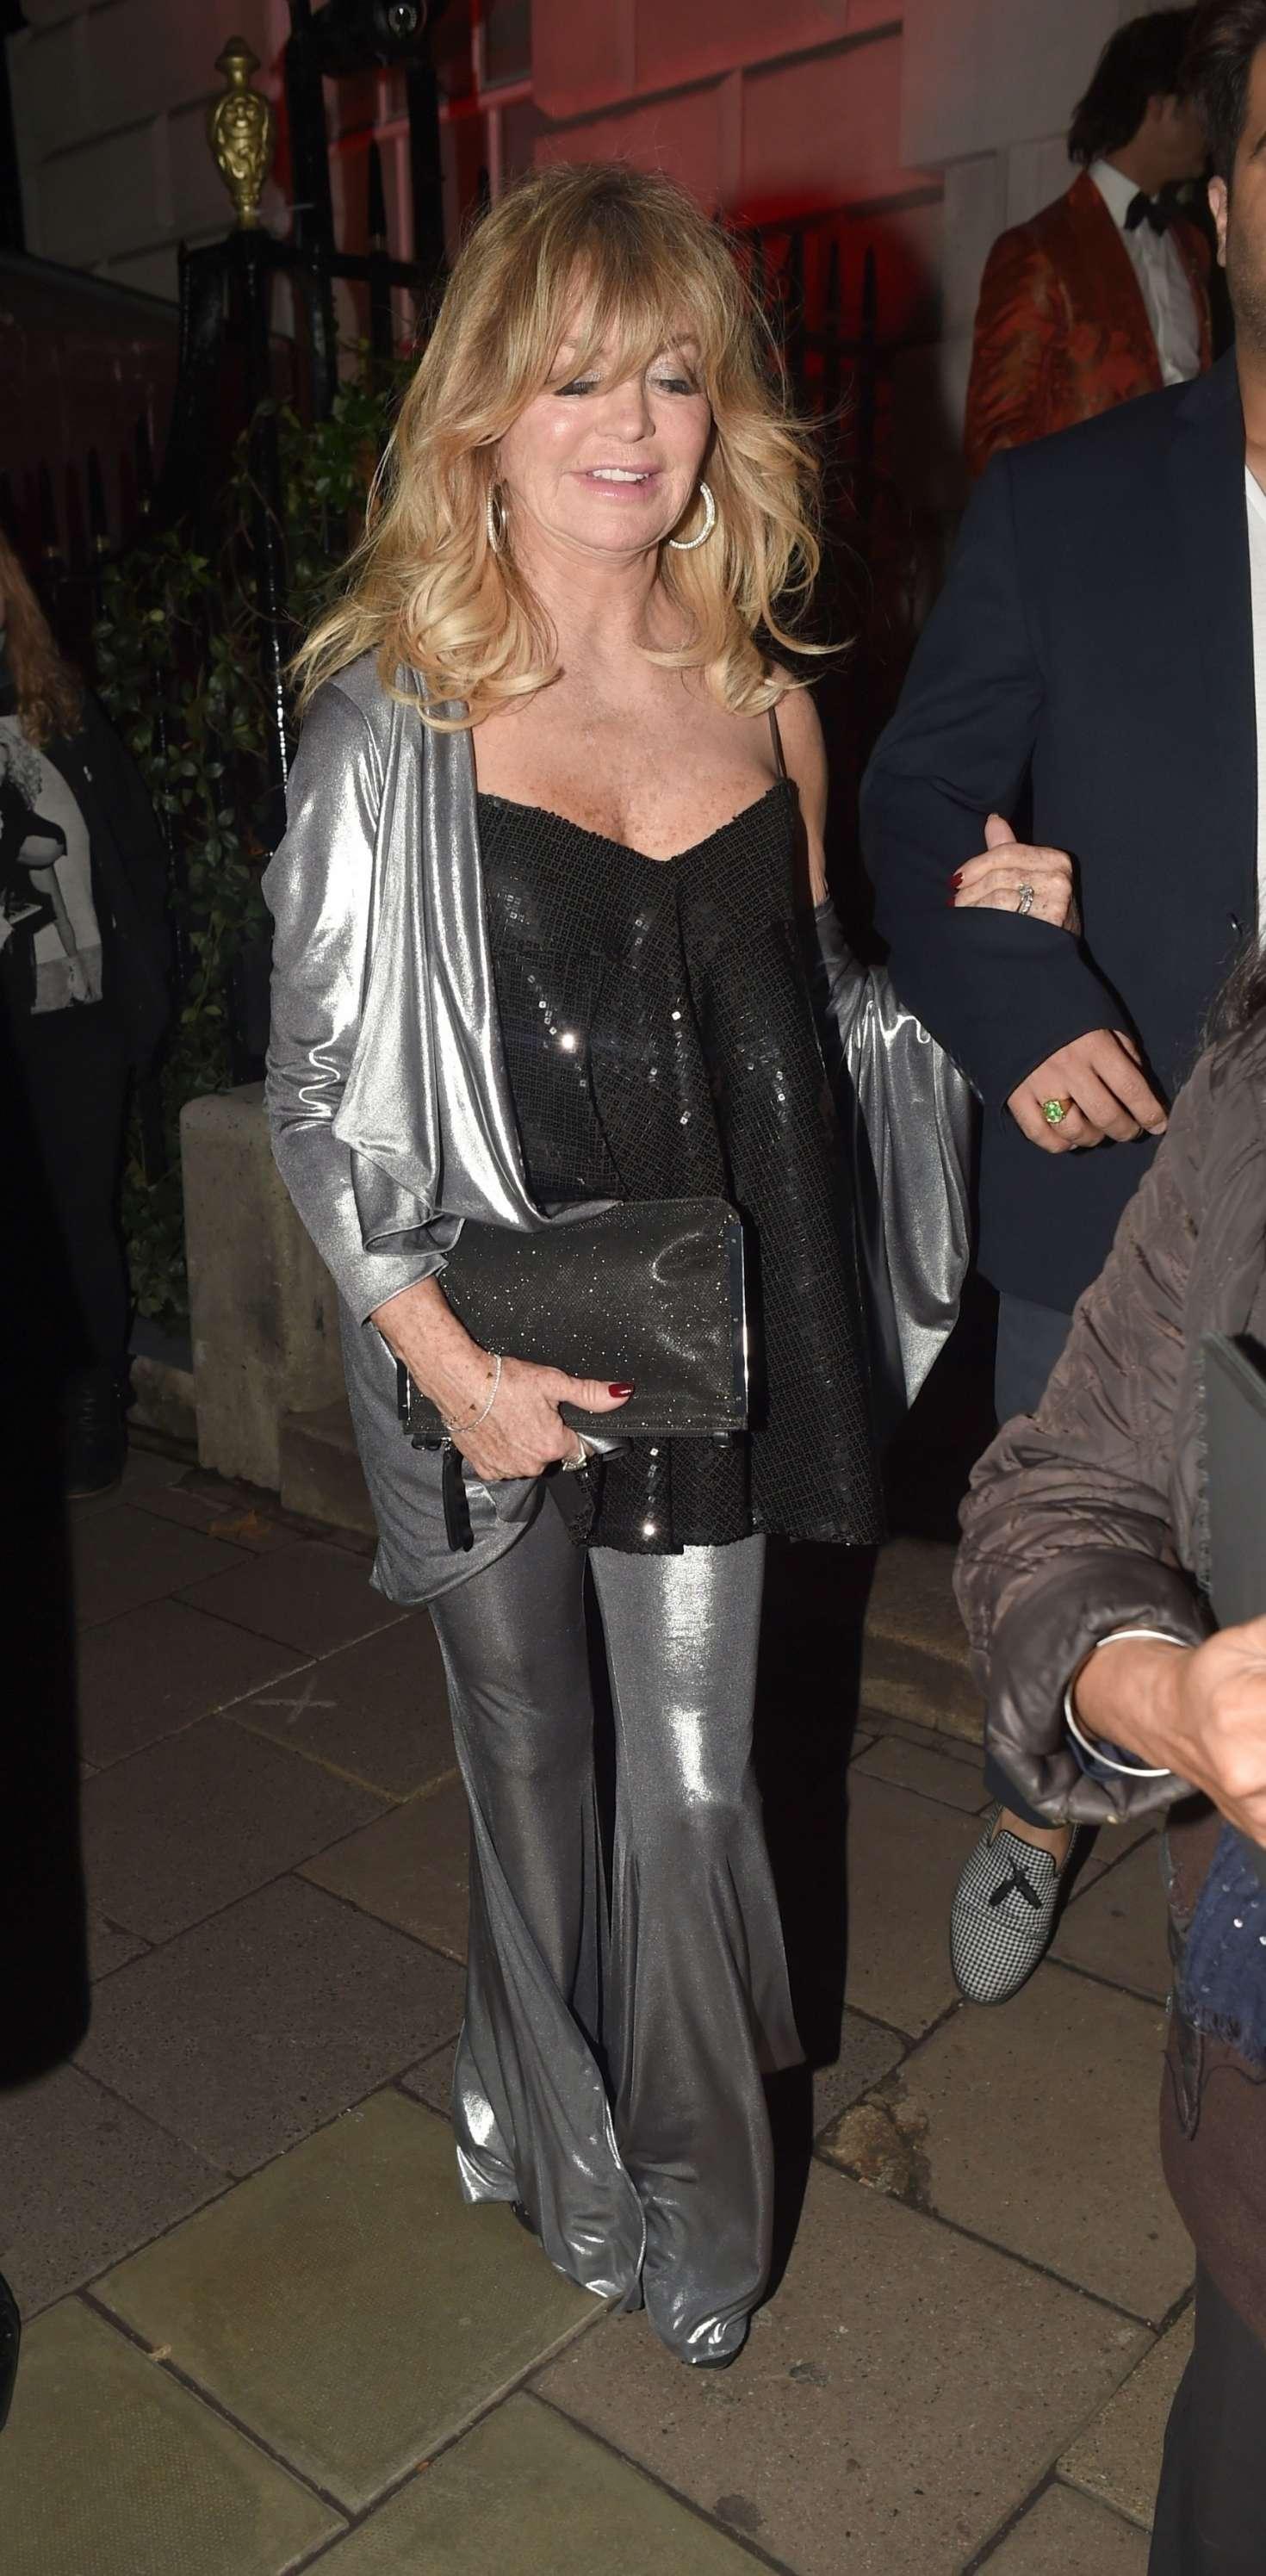 Goldie Hawn 2018 : Goldie Hawn: Goldies Love in Charity Fundraiser -07